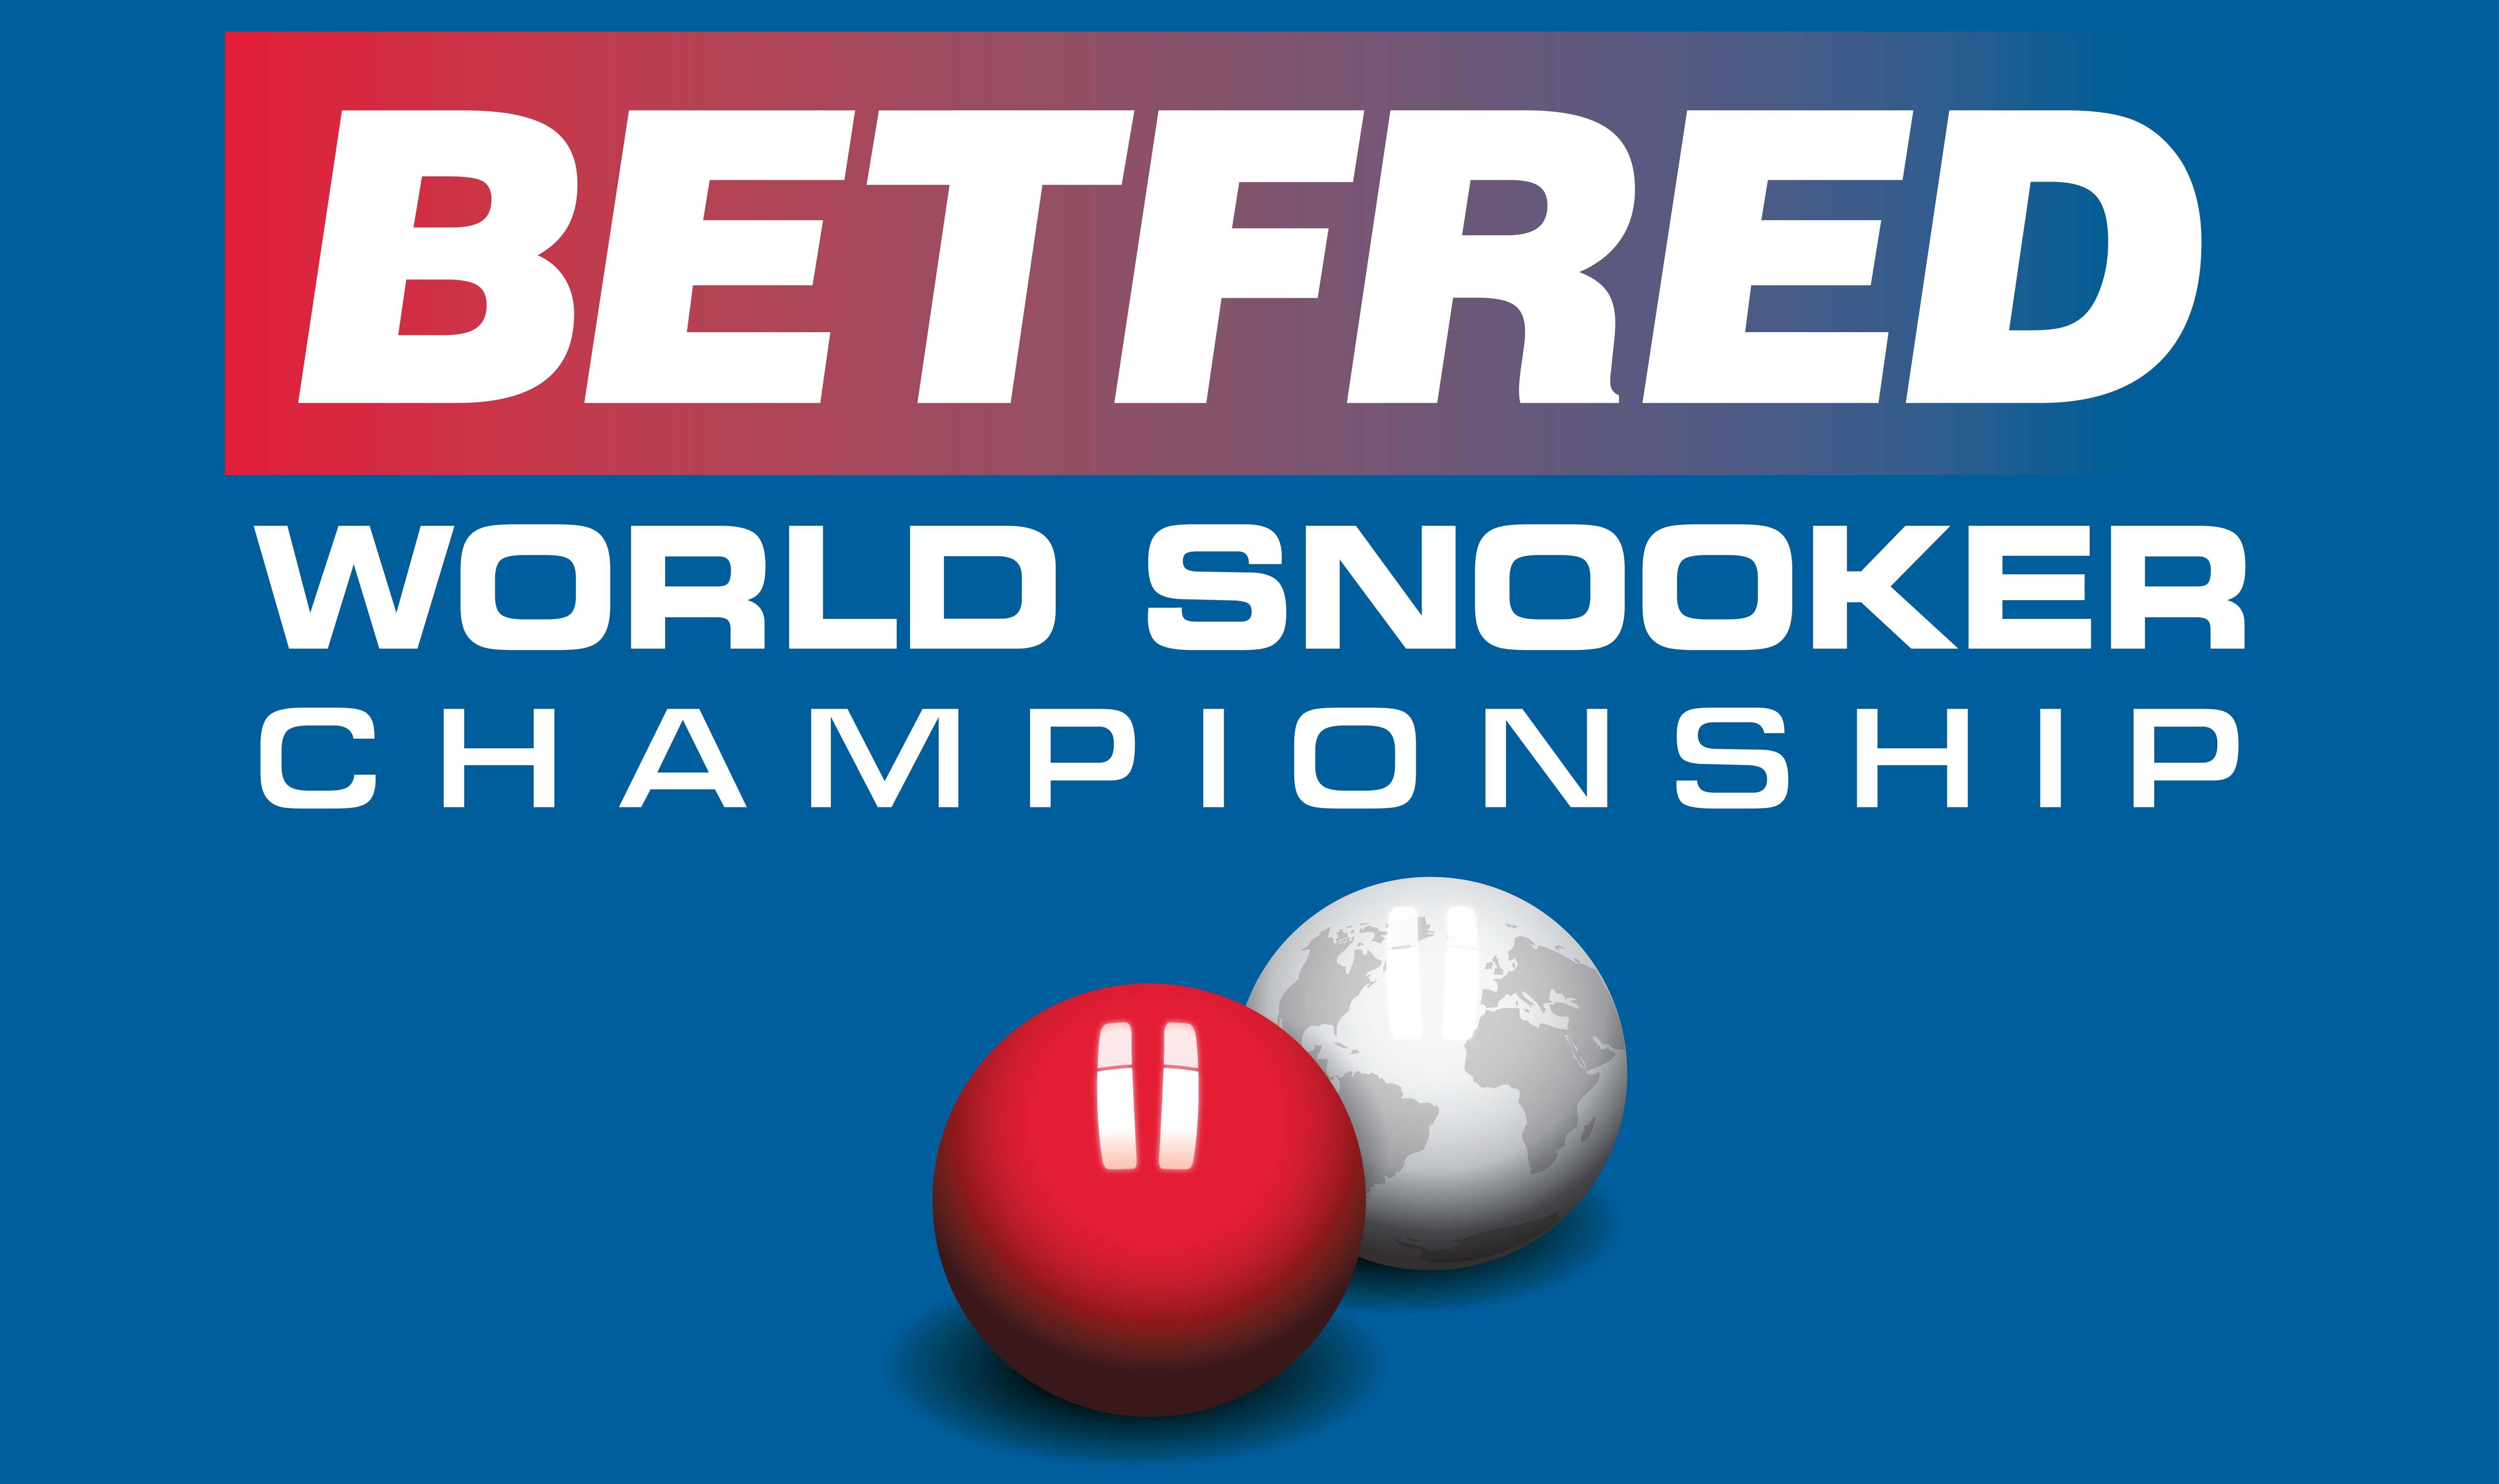 BetfredWorldSnooker_Logo02